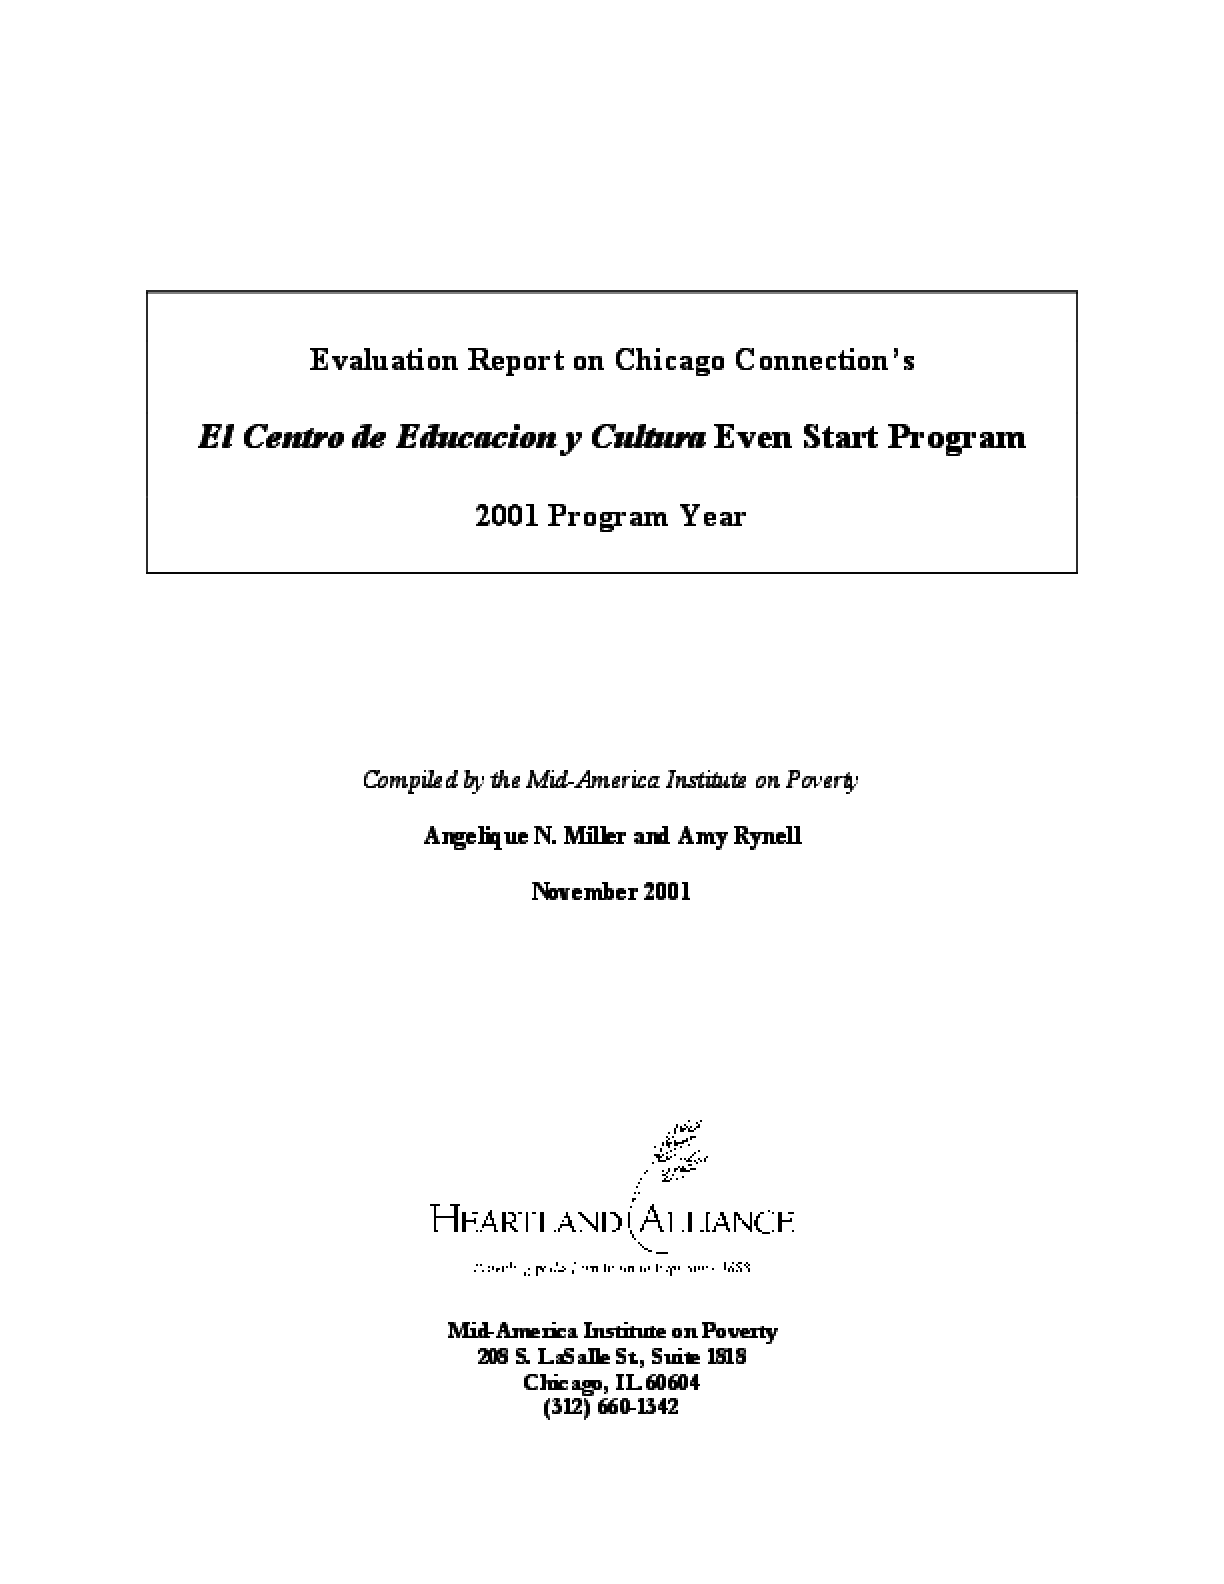 Evaluation Report on Chicago Connection's Refugee Even Start Program